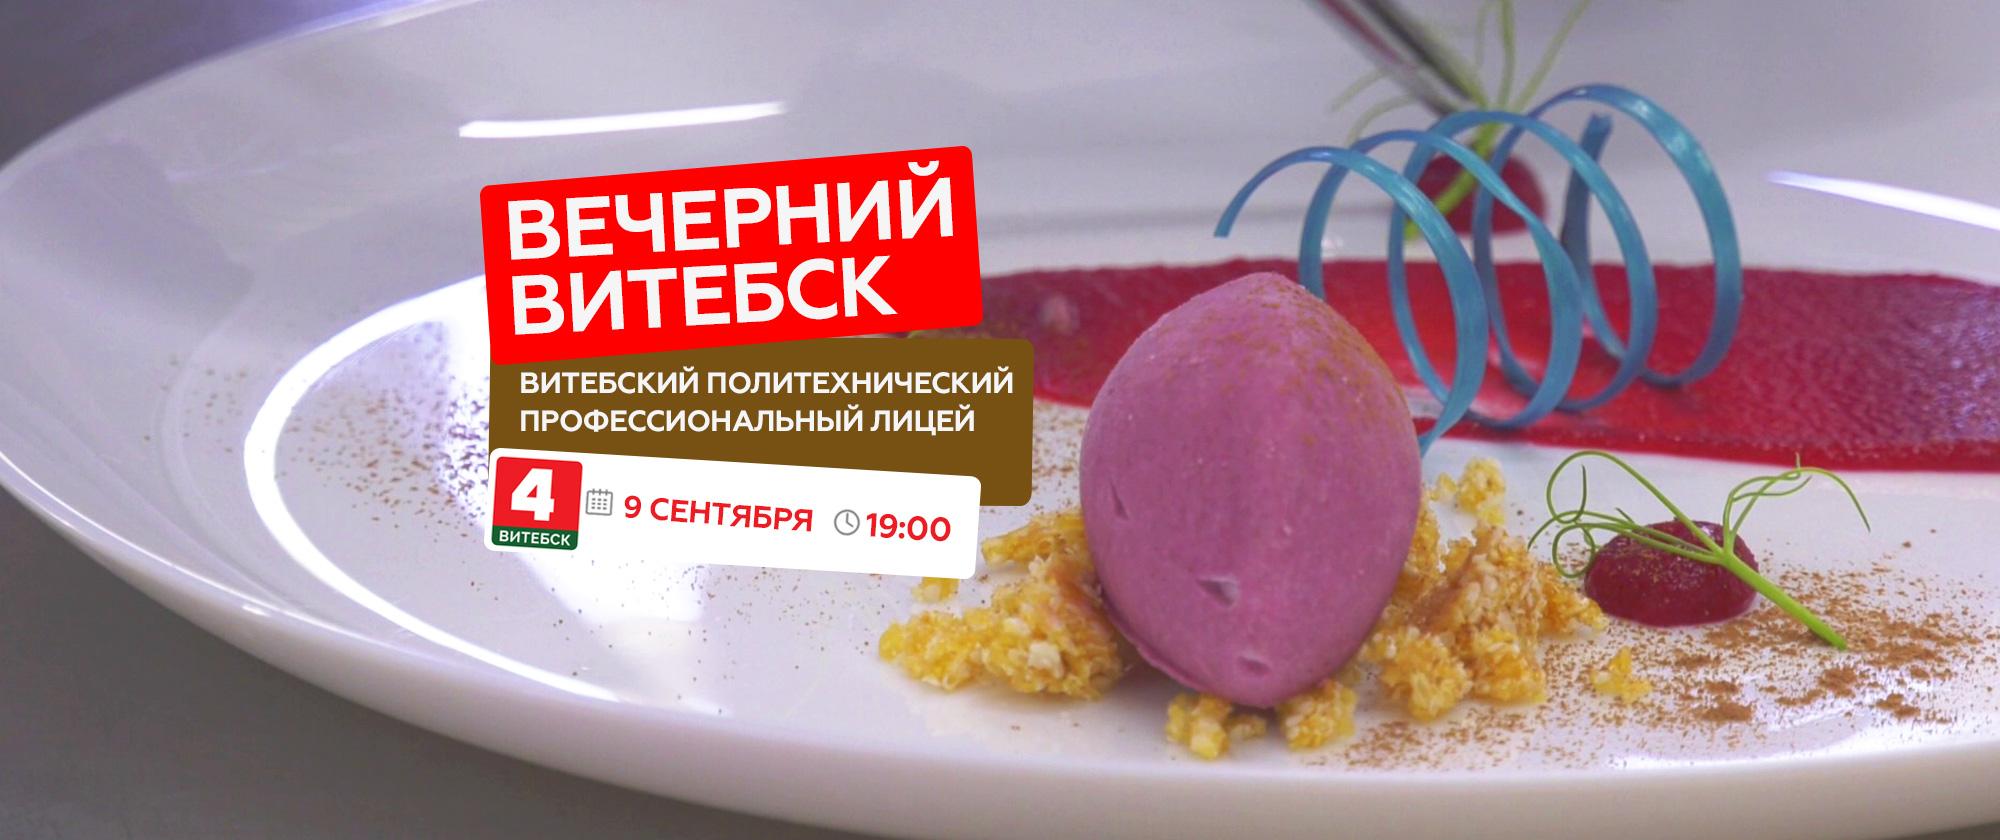 vechernij vitebsk 9 sentjabrja - Вечерний-Витебск-9-сентября